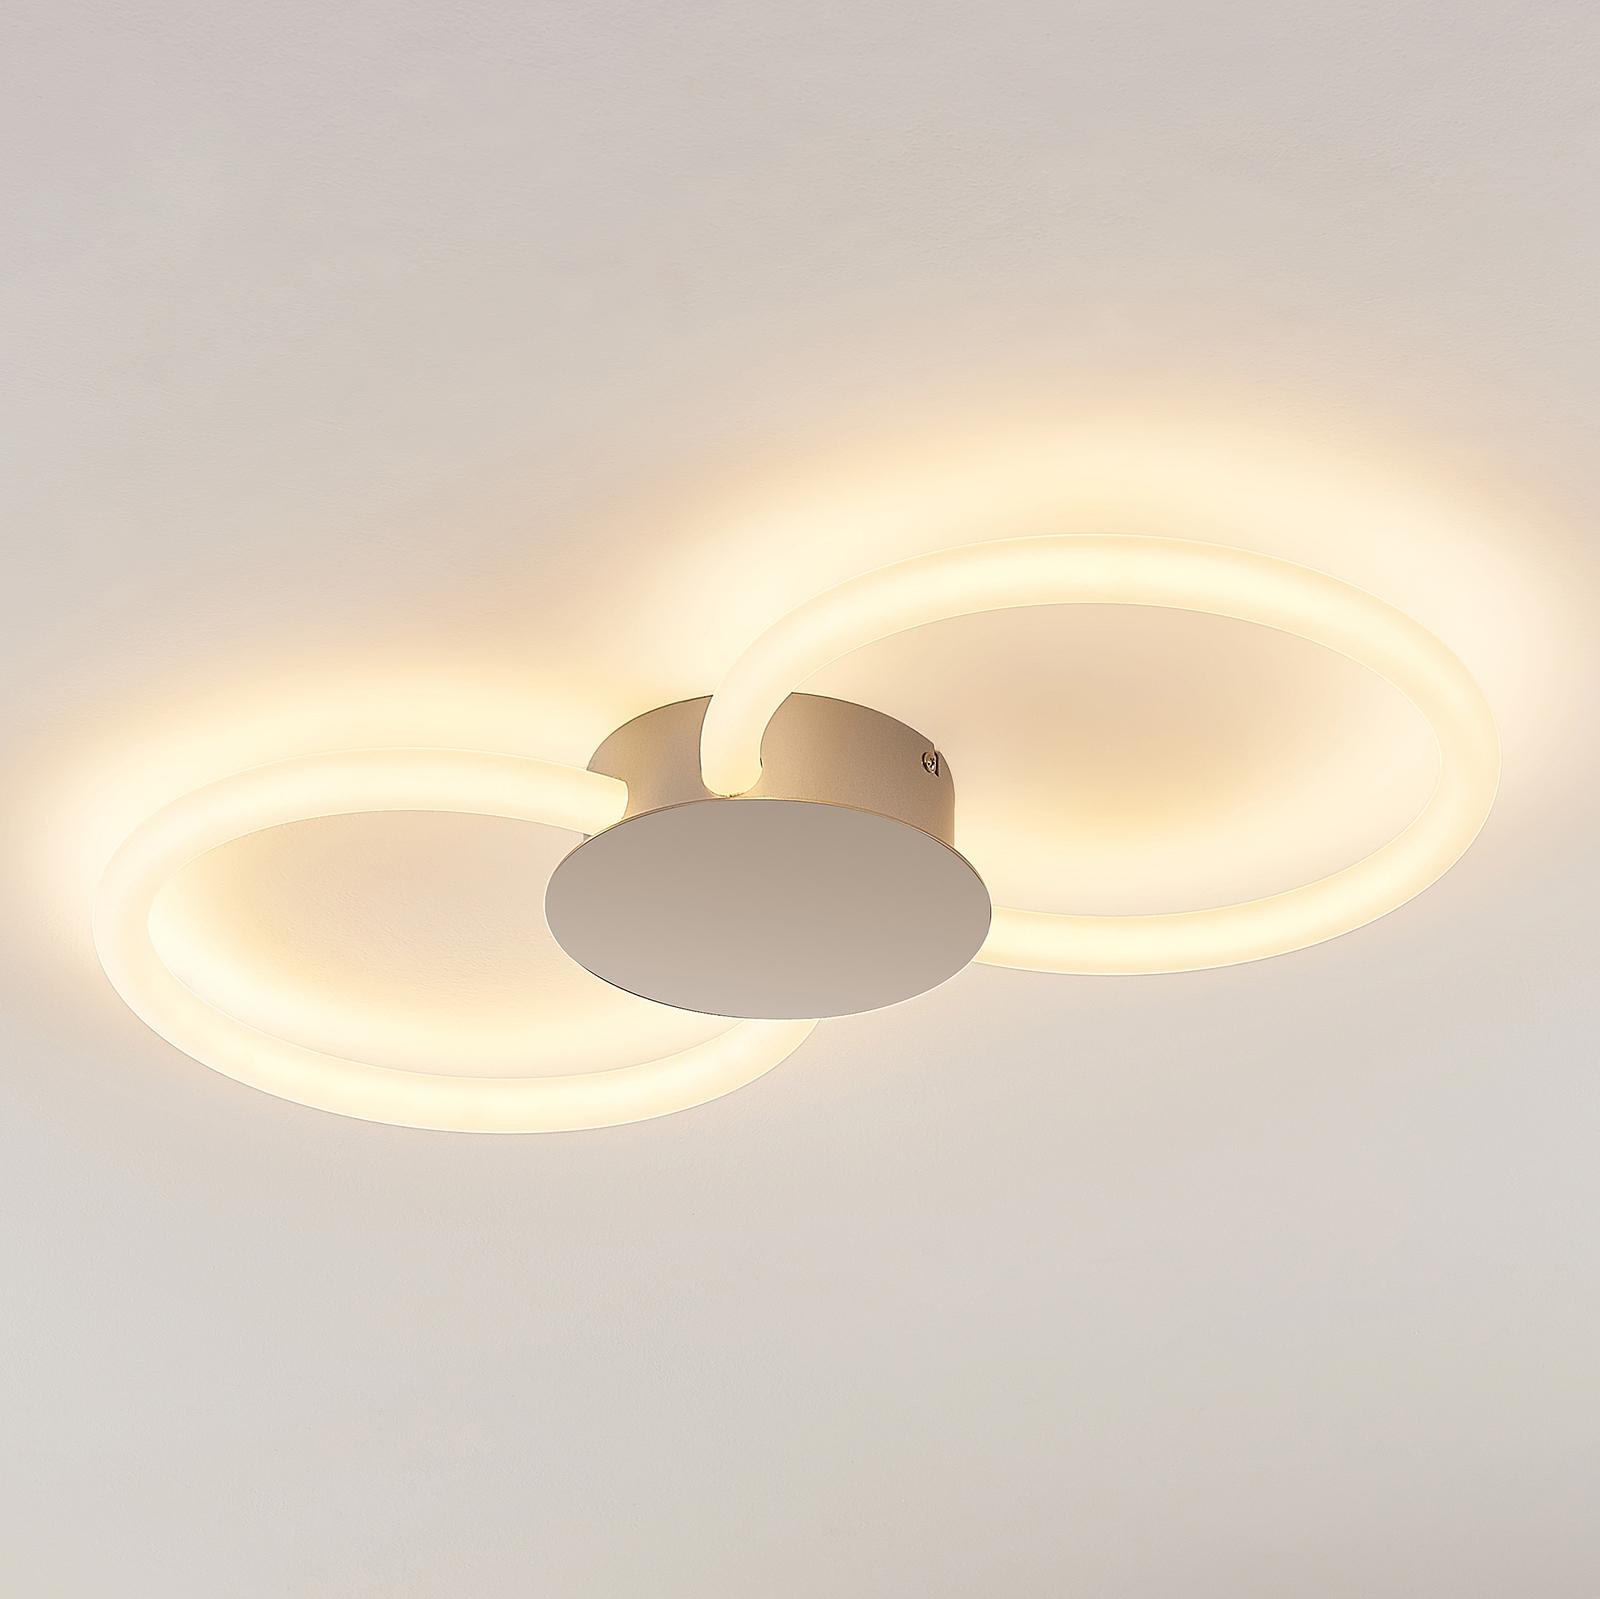 Lucande Clasa lampa sufitowa LED, 2-punktowa